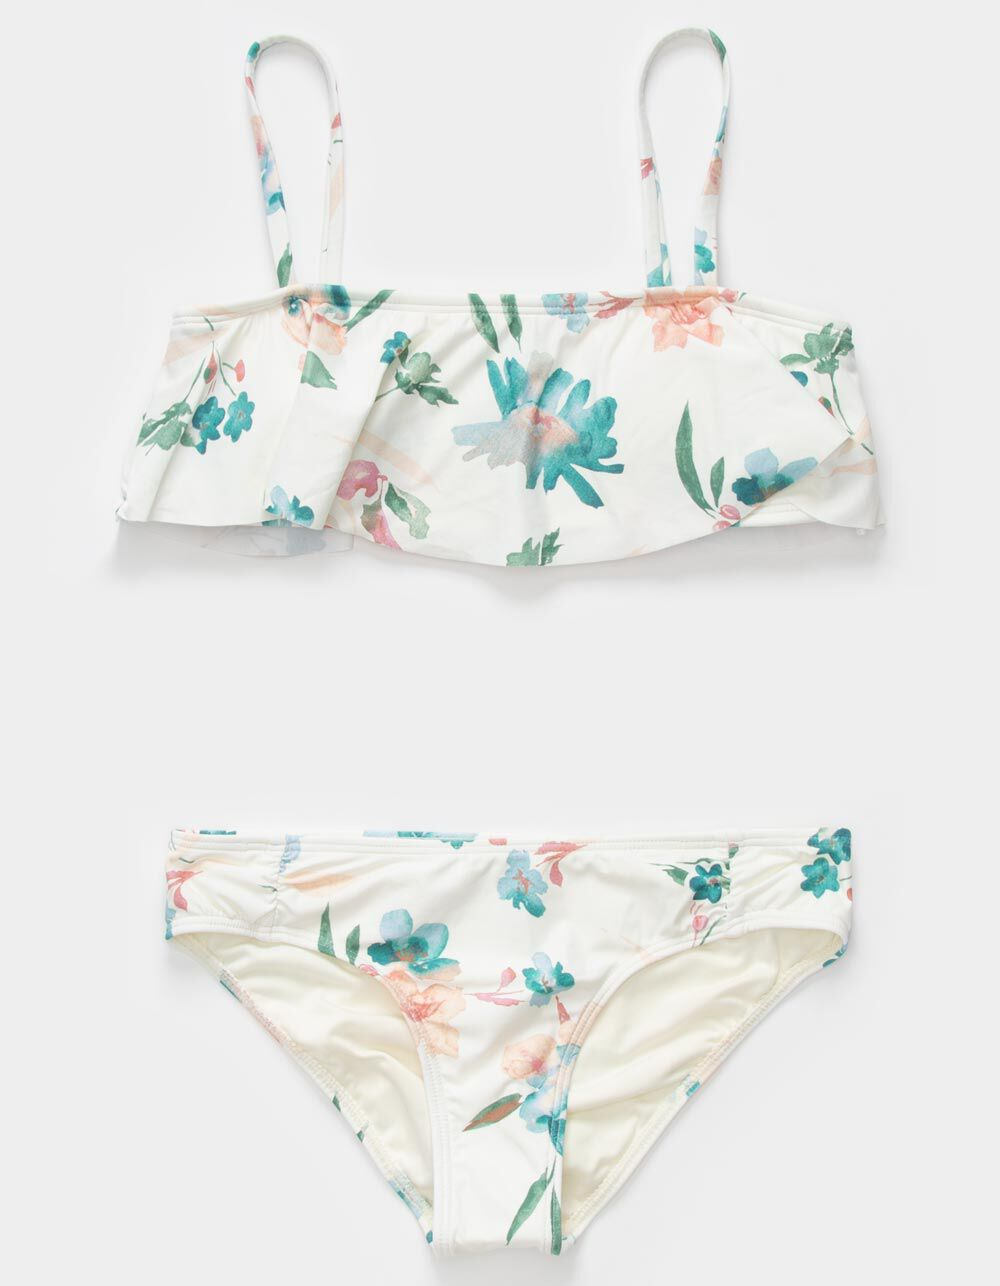 O'NEILL Seabright Ruffle Girls White Bandeau Bikini Set